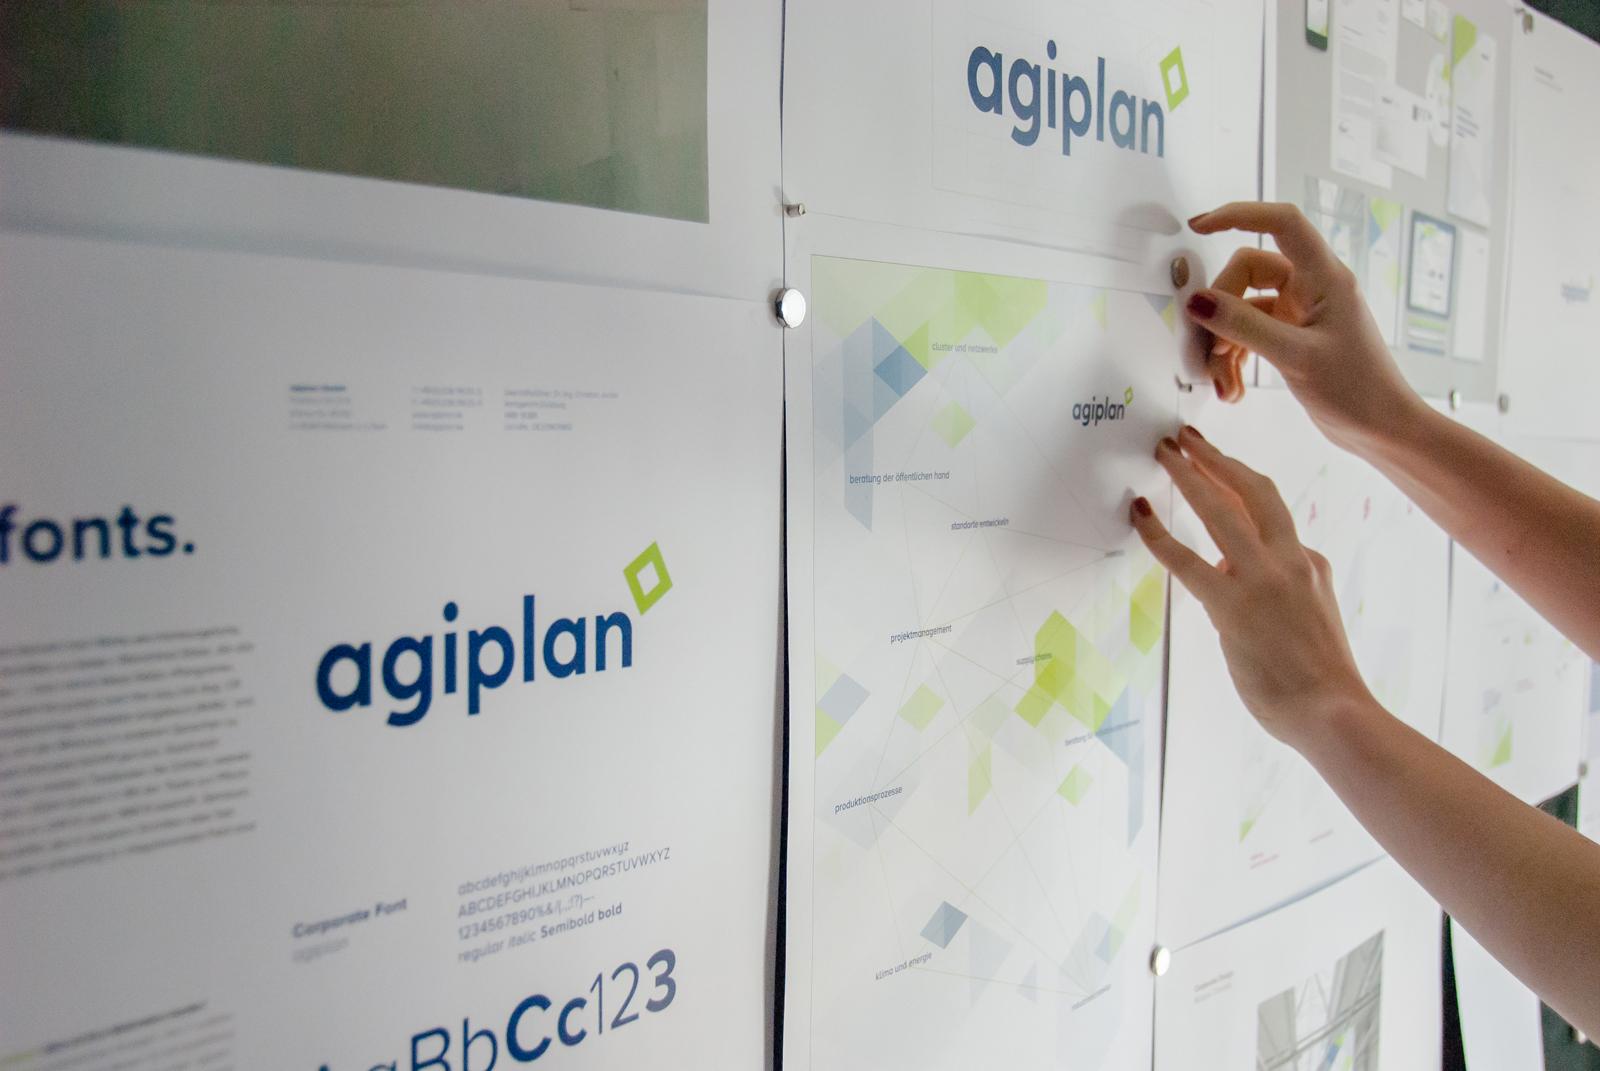 agiplan_CD-02_2